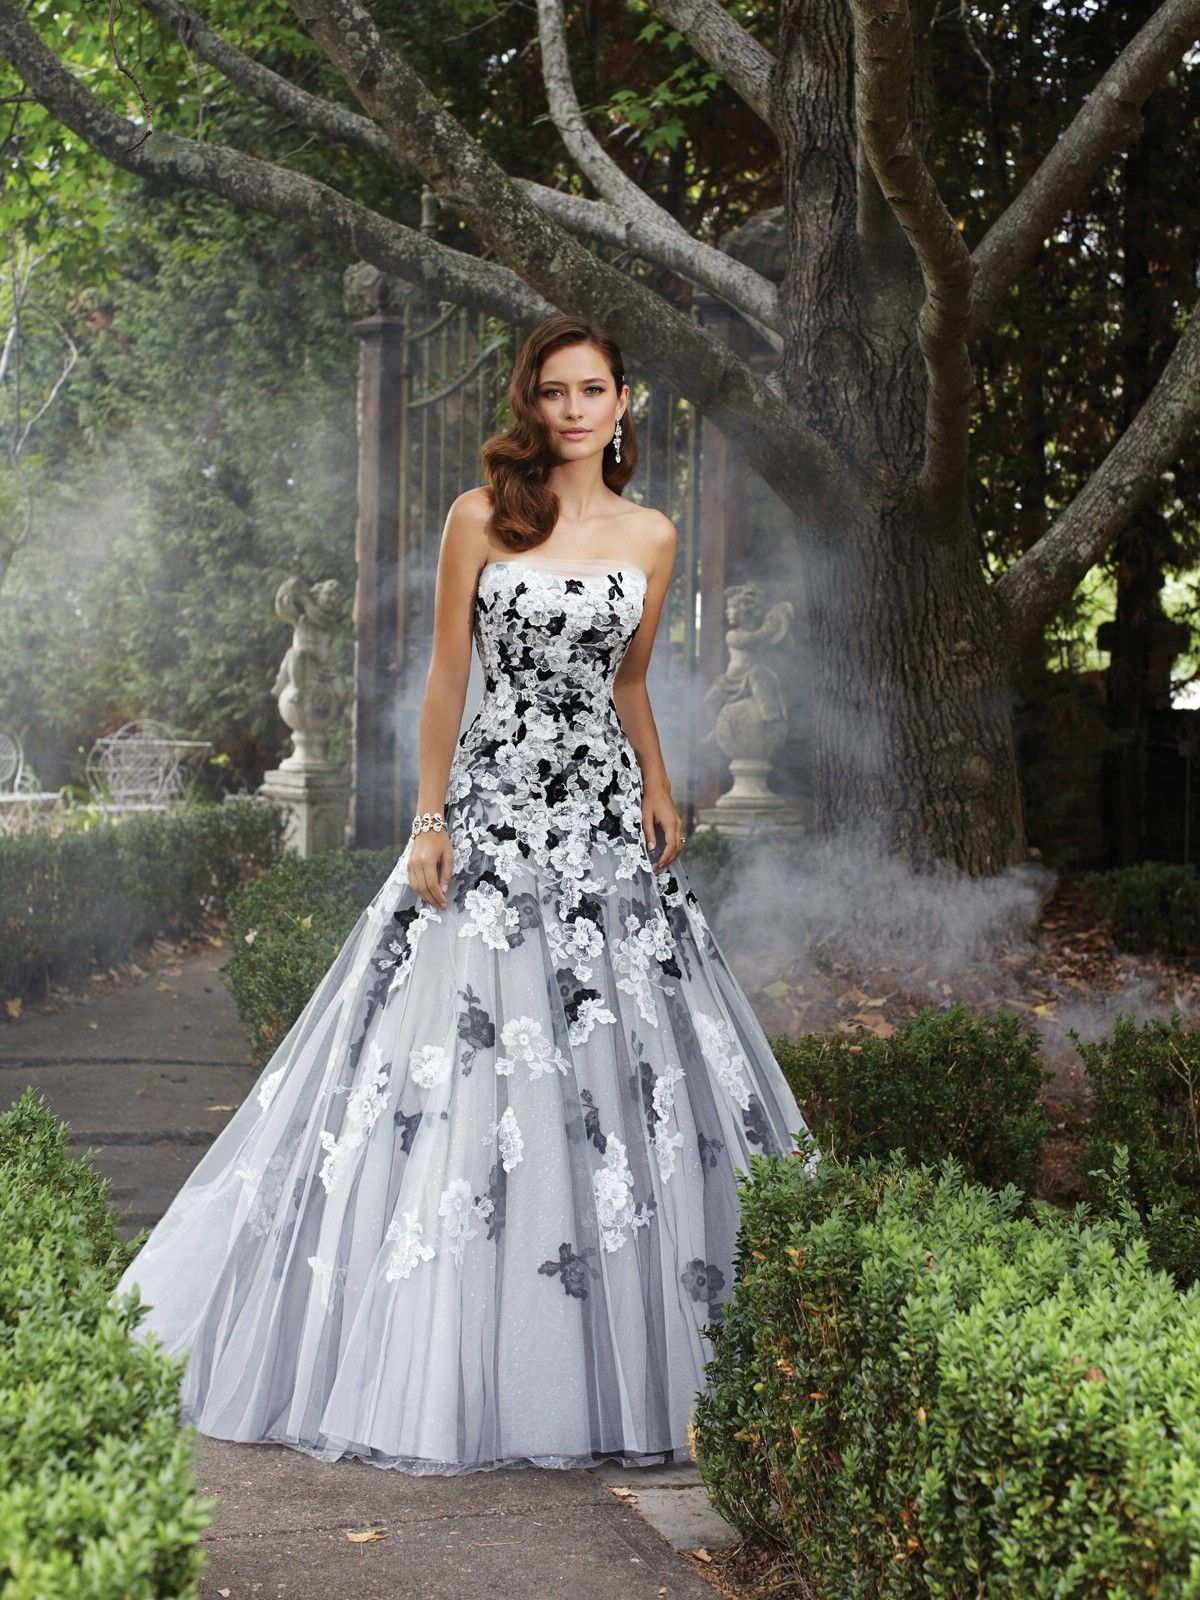 Blue grey wedding dress  Strapless Black and White Modern Wedding Dress with  luulla prom